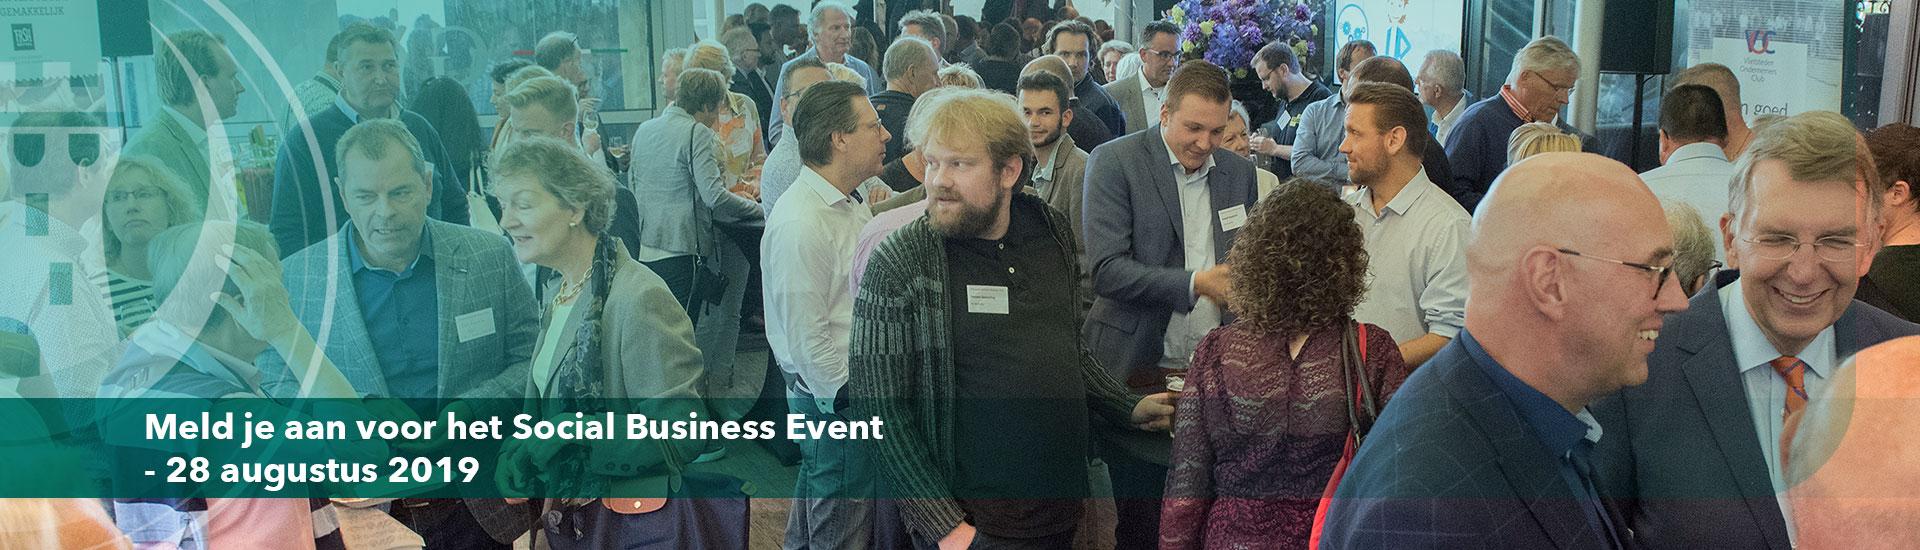 banner-social-business-event